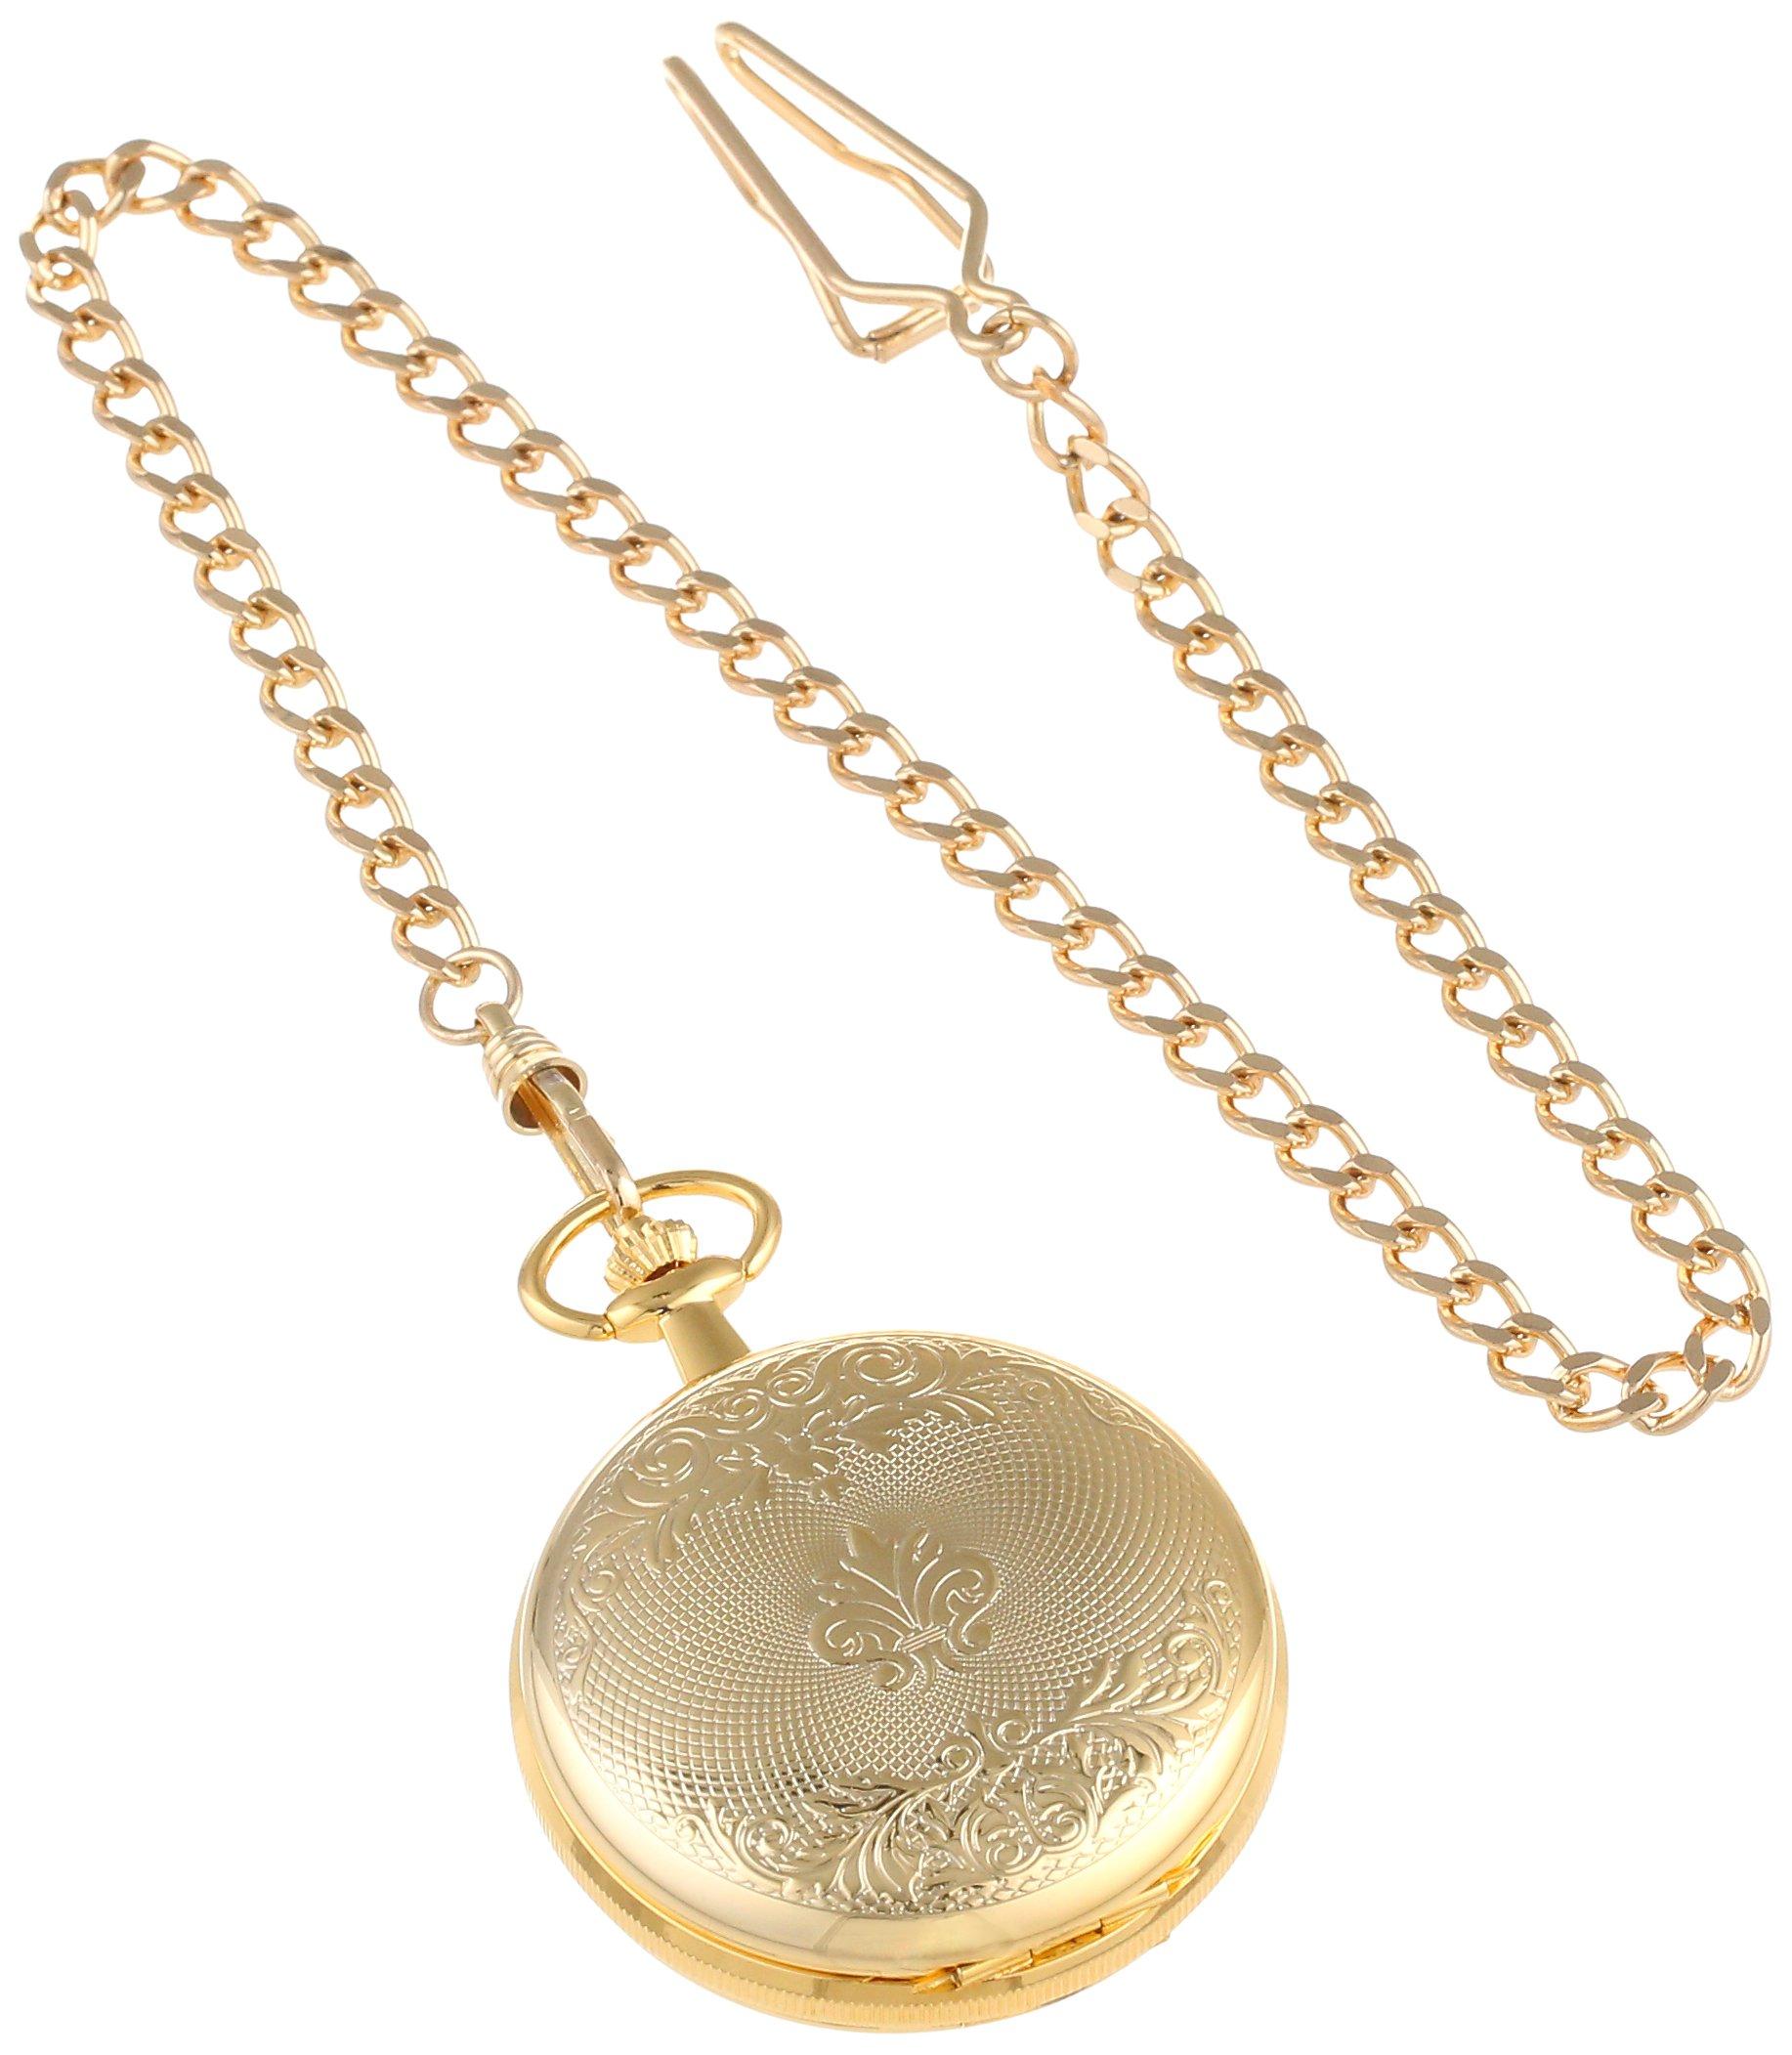 Charles-Hubert, Paris 3556 Gold-Plated Mechanical Pocket Watch by CHARLES-HUBERT PARIS (Image #3)